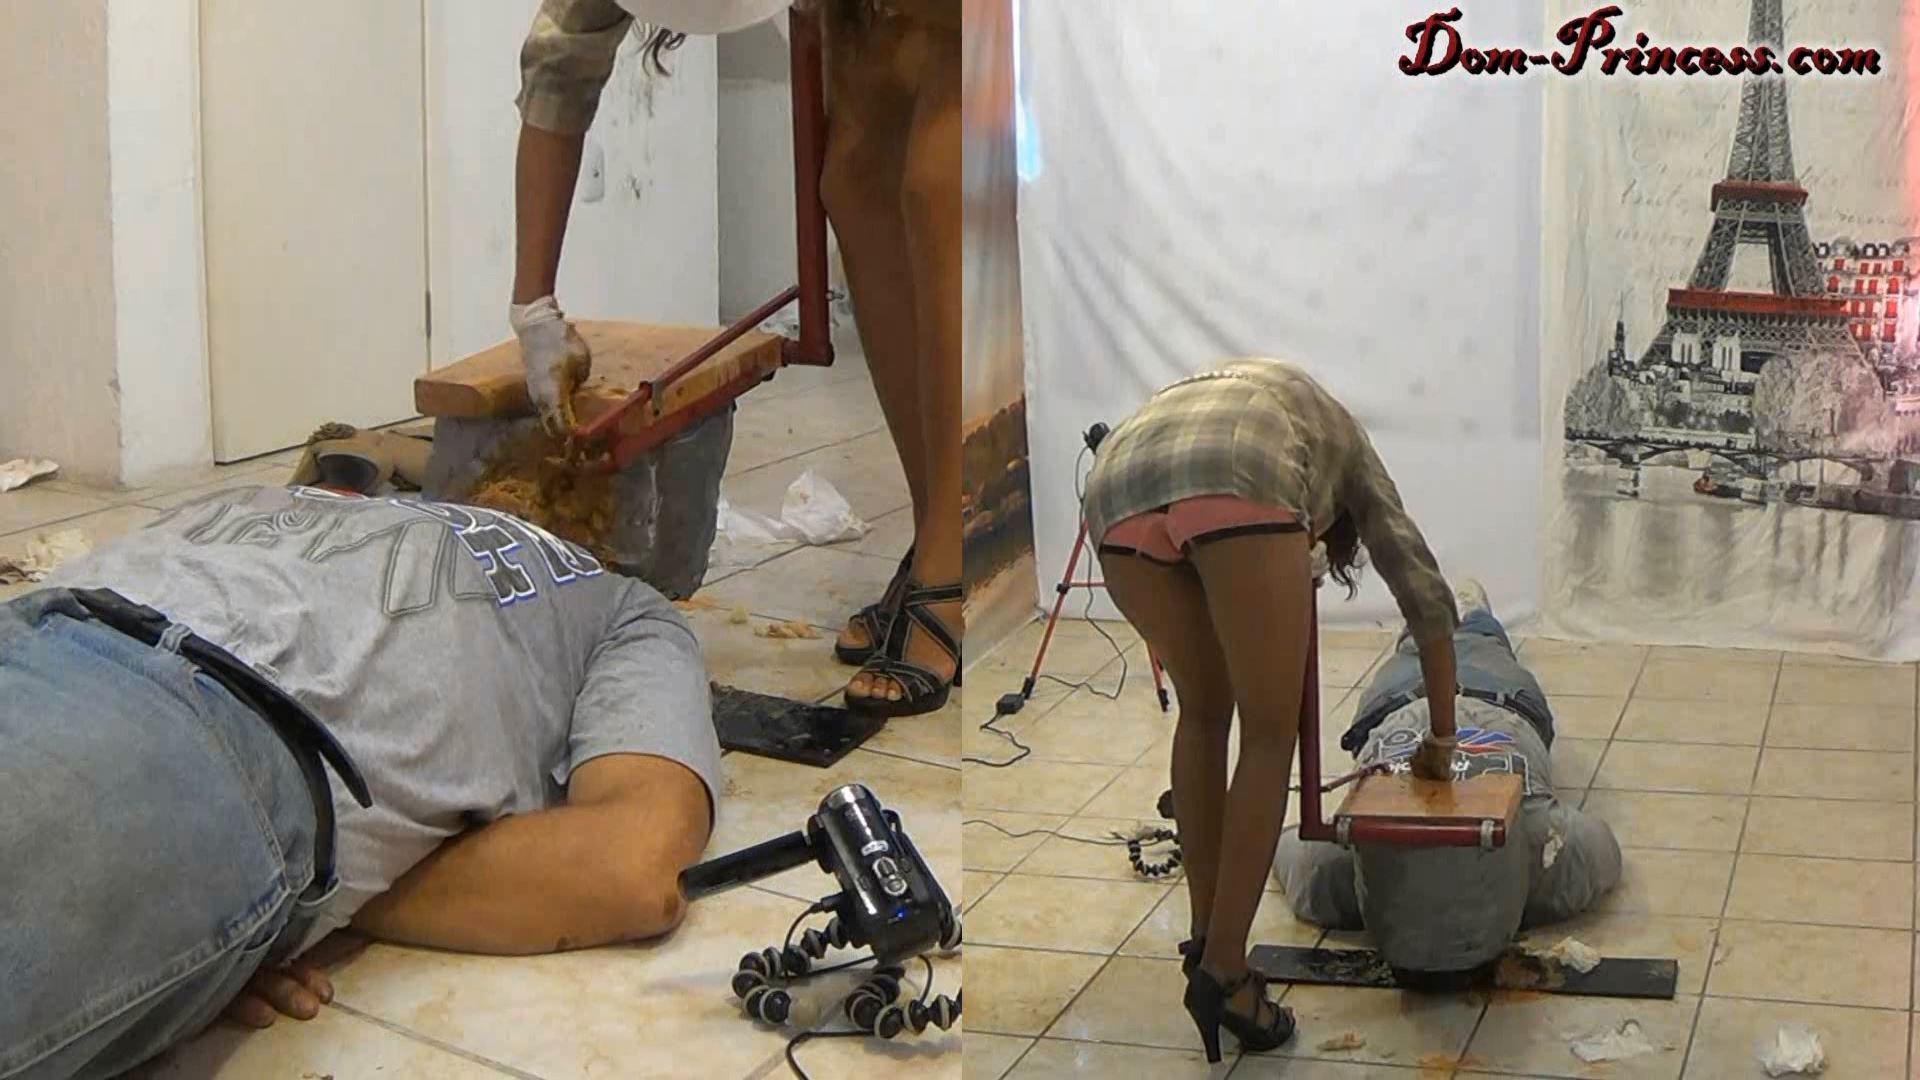 [DOM-PRINCESS / SCAT-PRINCESS] Toilet Slave Enforcement Kit 4 Carmen [FULL HD][1080p][MP4]